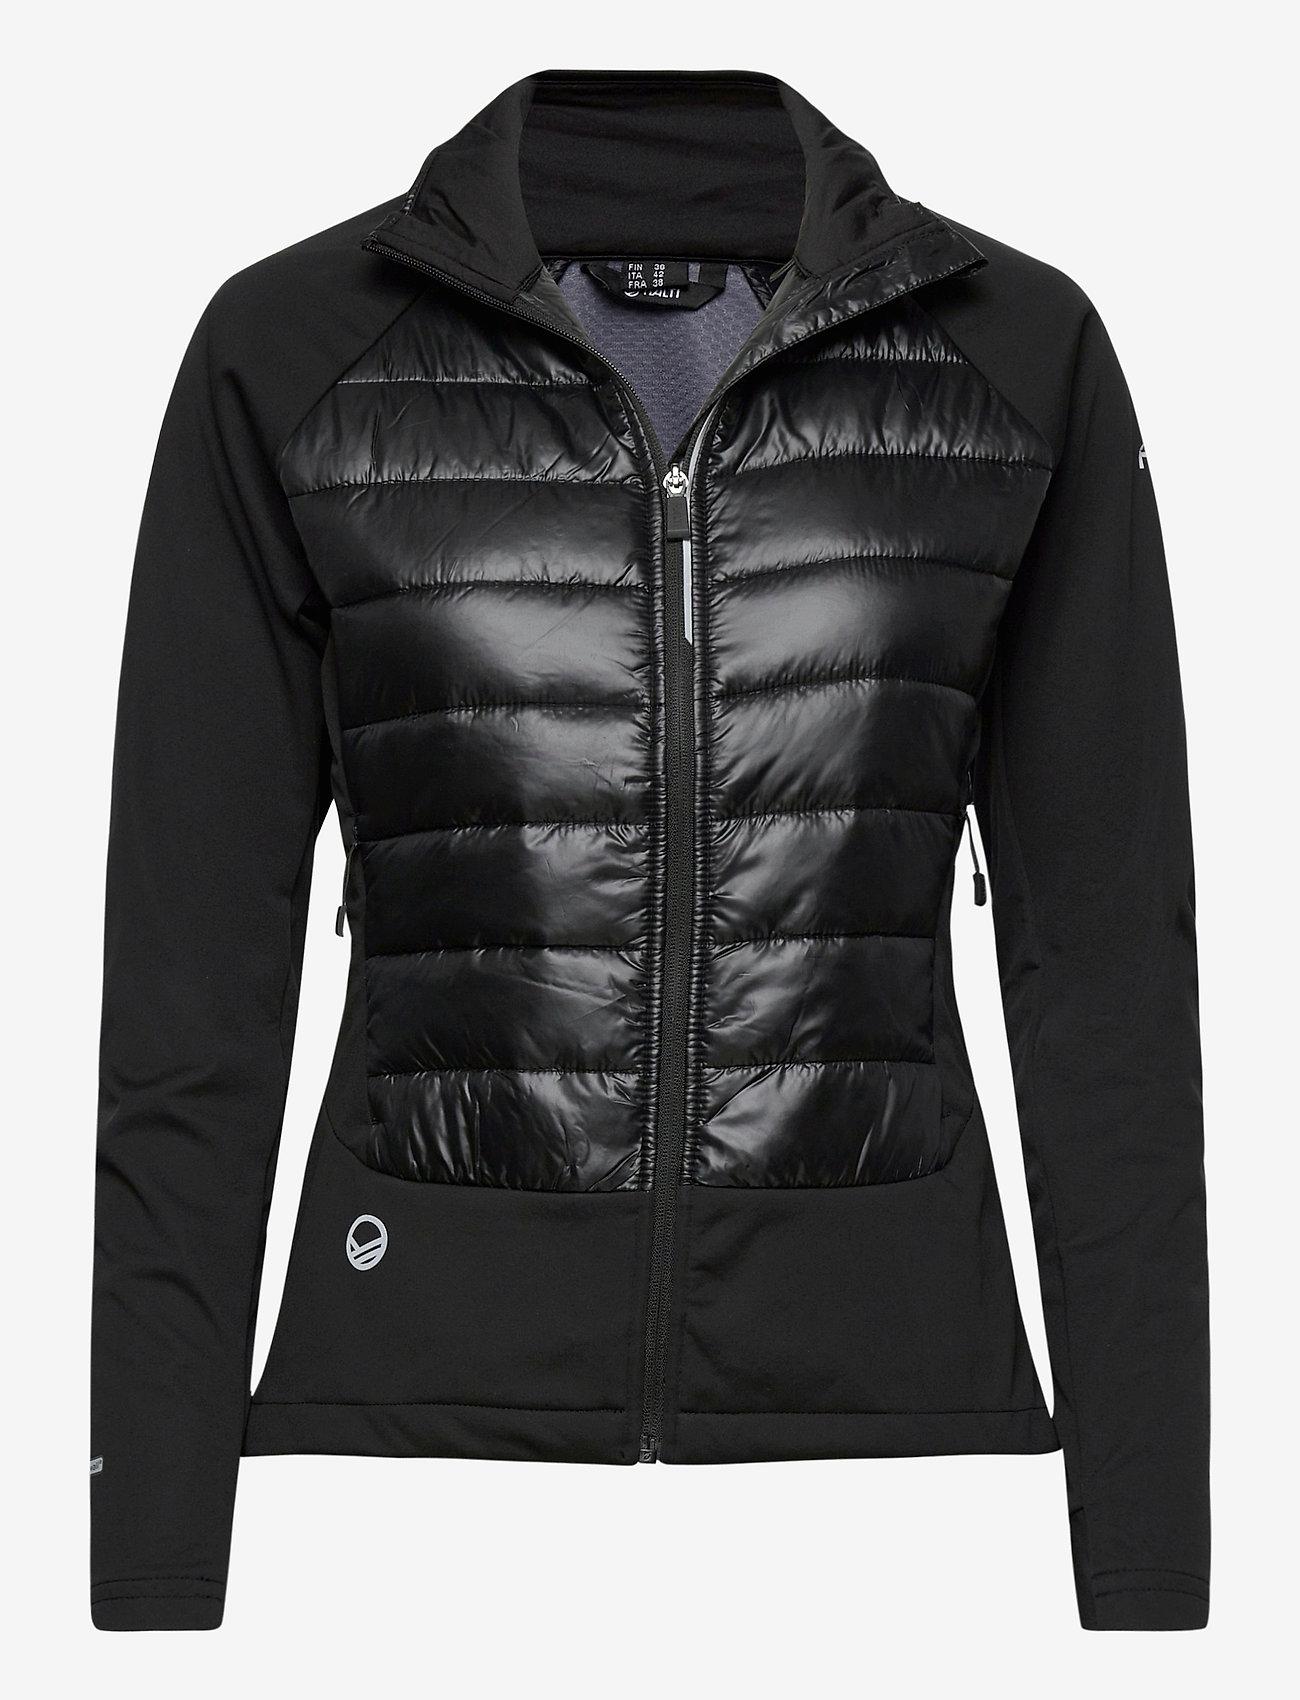 Halti - Olos Women's Hybrid Cross Country Ski Jacket - laskettelutakki - black - 0